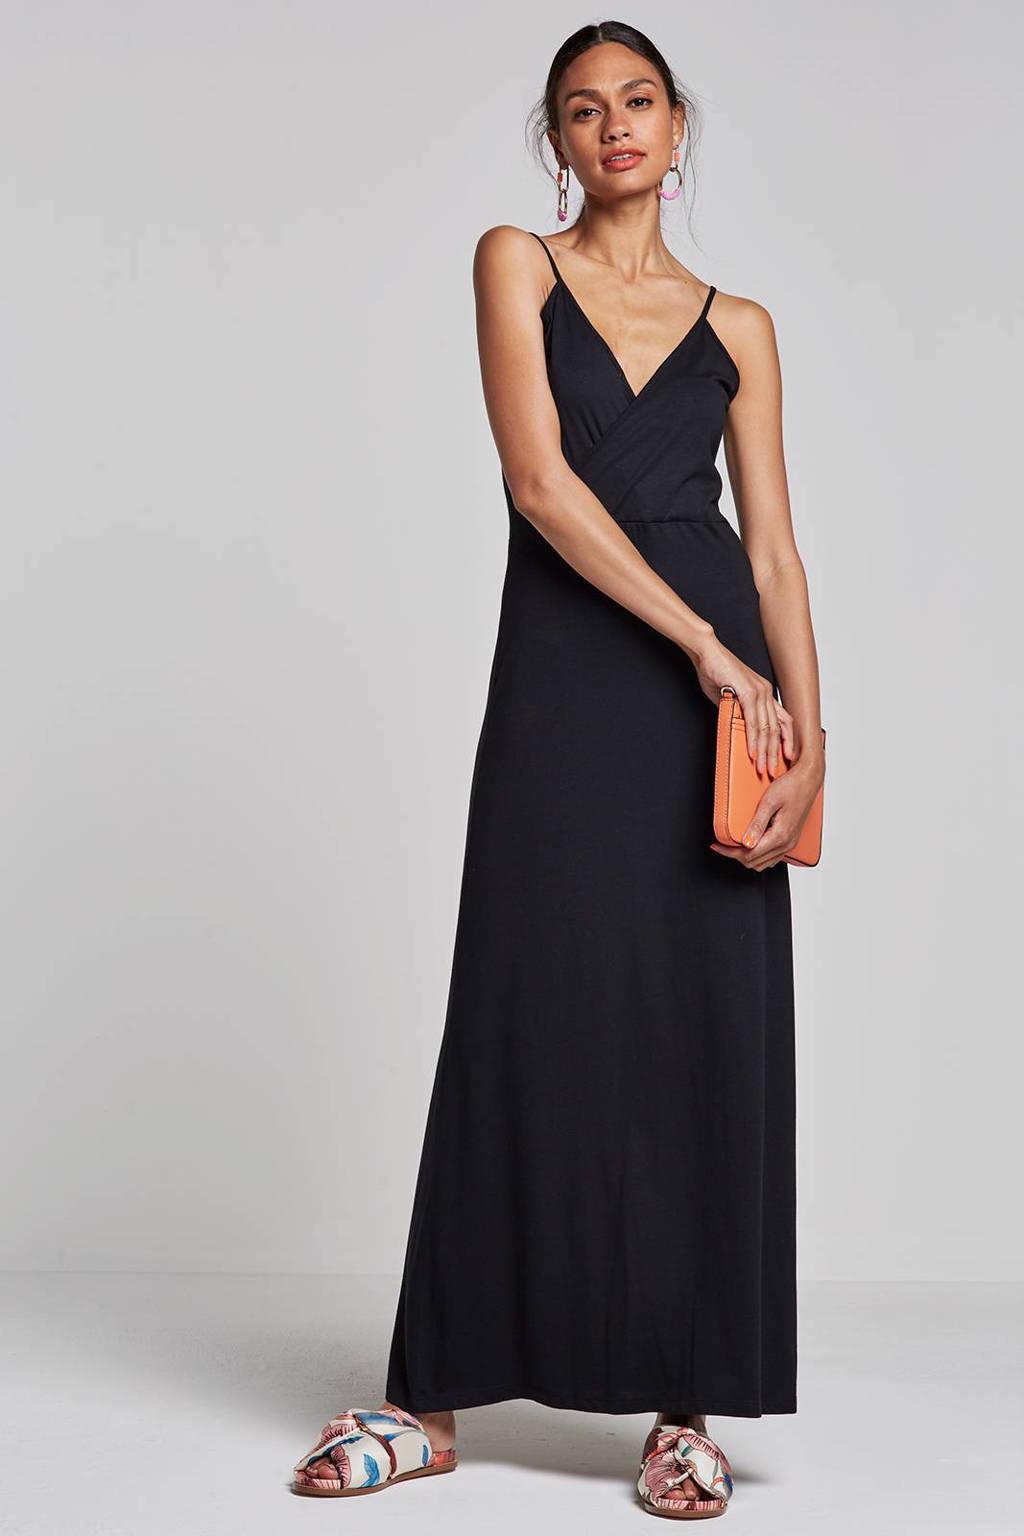 827abcbae424af ESPRIT edc Women mouwloze maxi jurk